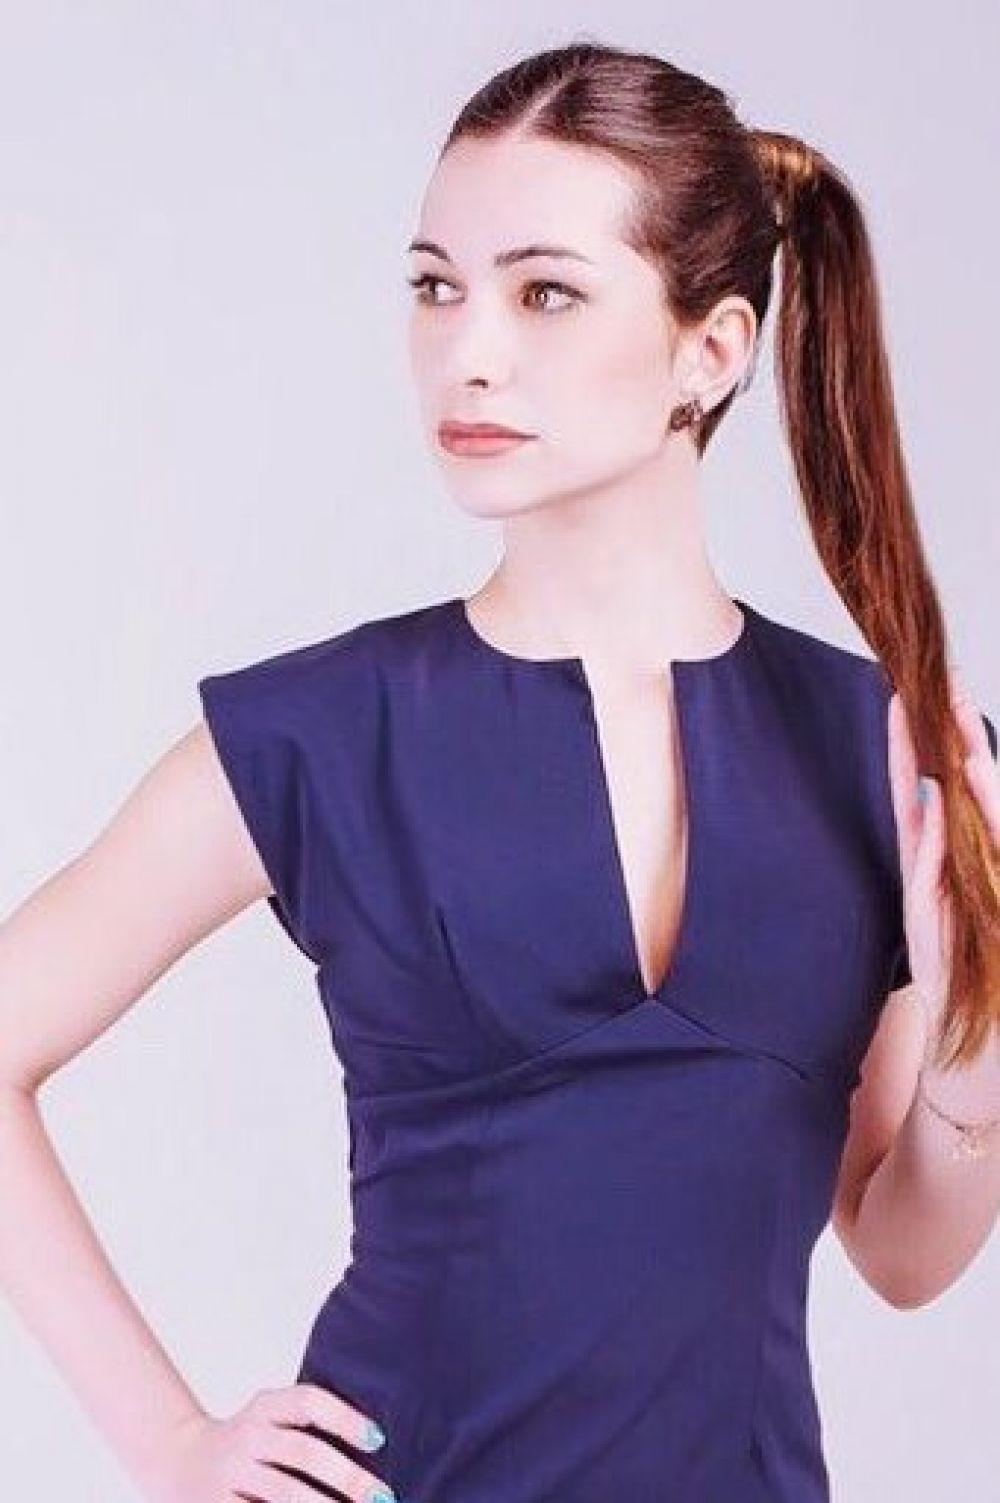 Кристина Шубина, Волгоградская область